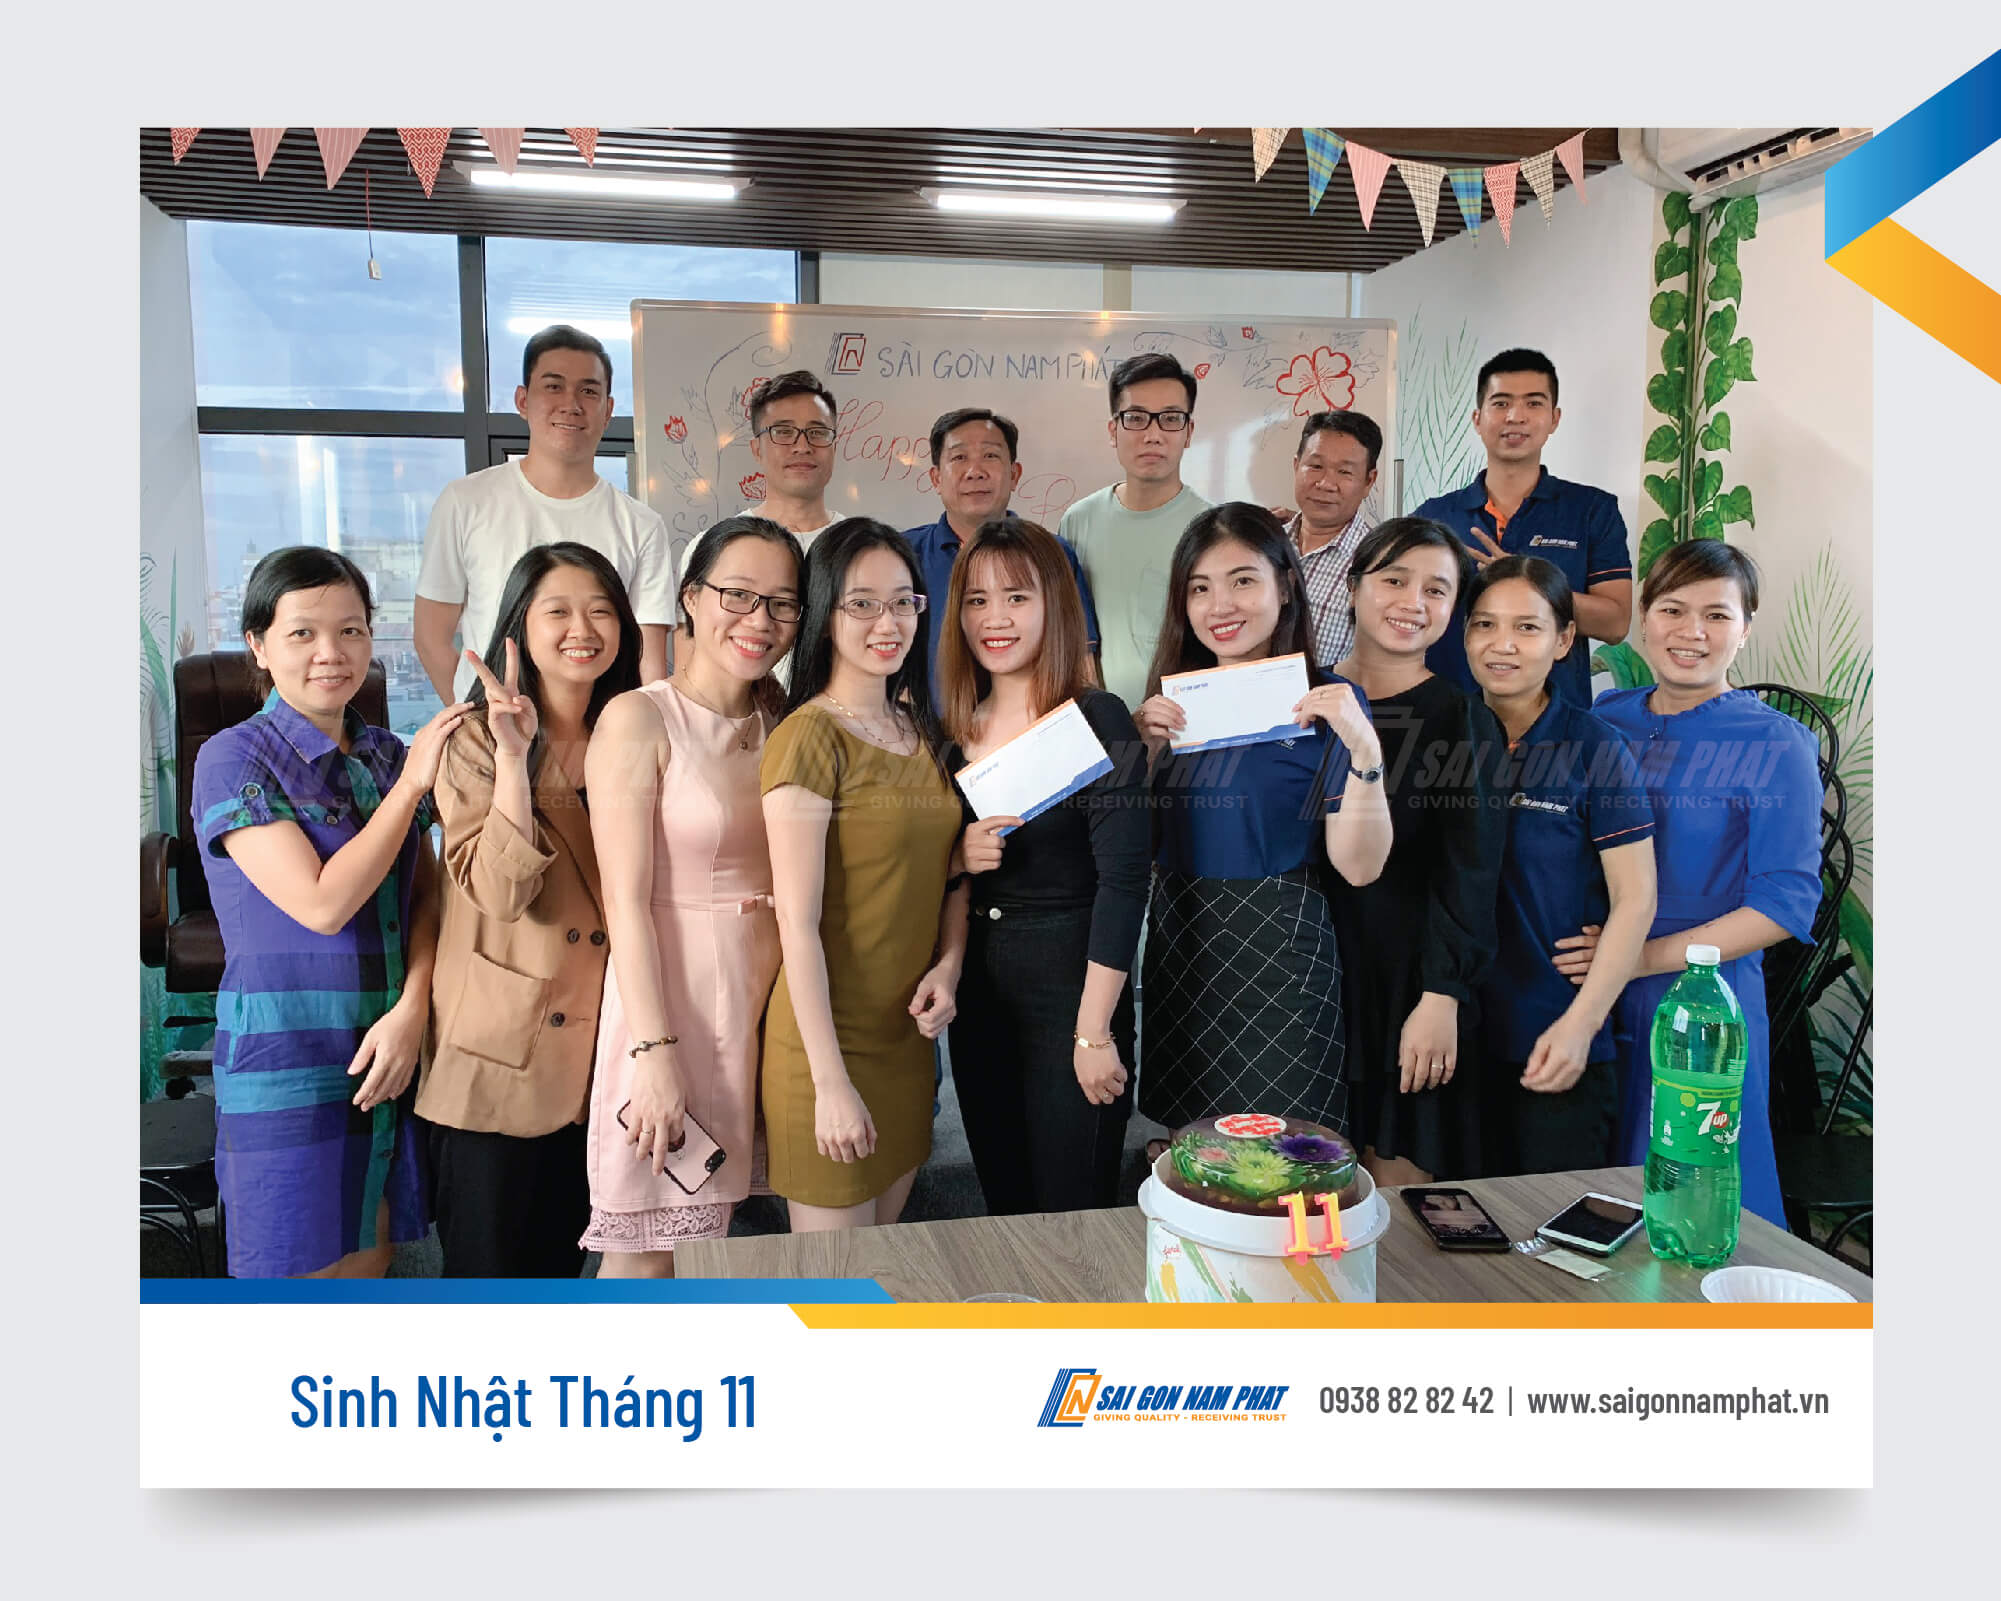 happy-birth-day-cac-thanh-vien-thang-11-tai-sai-gon-nam-phat